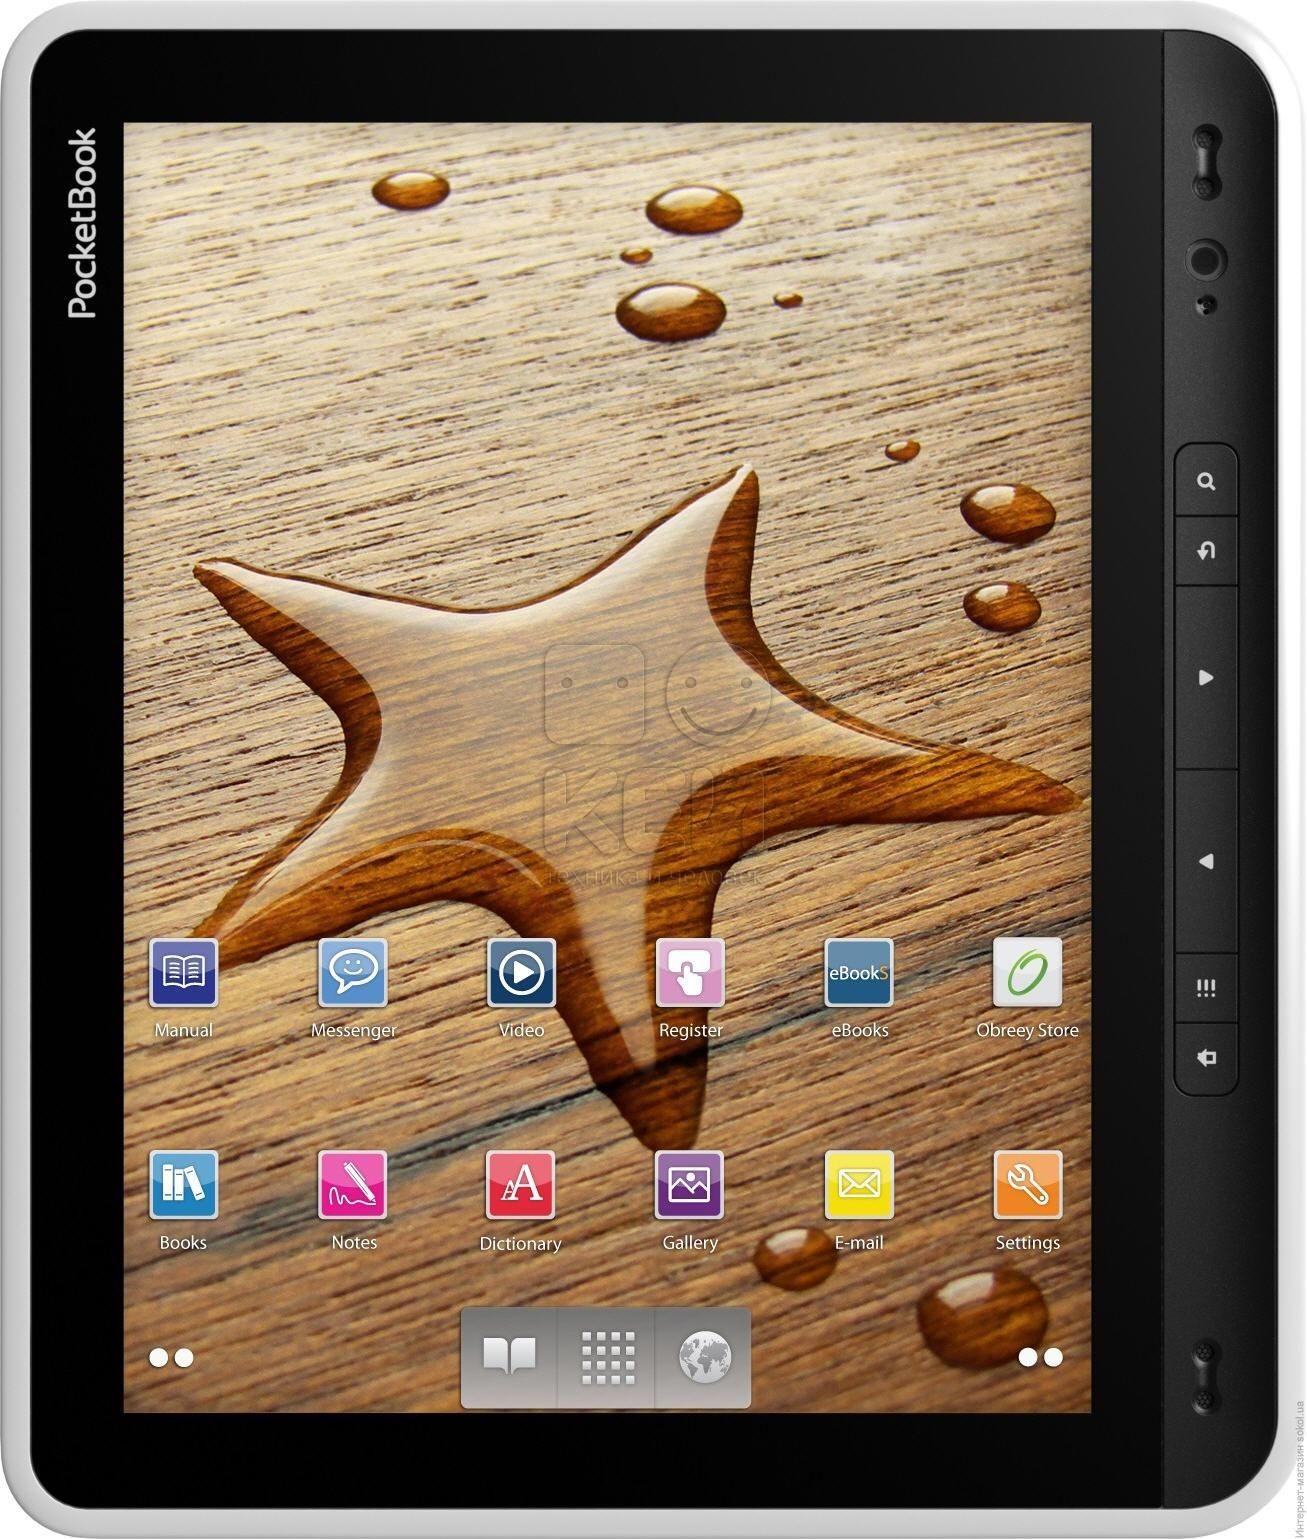 OS Android: Электронная книга Андроиде